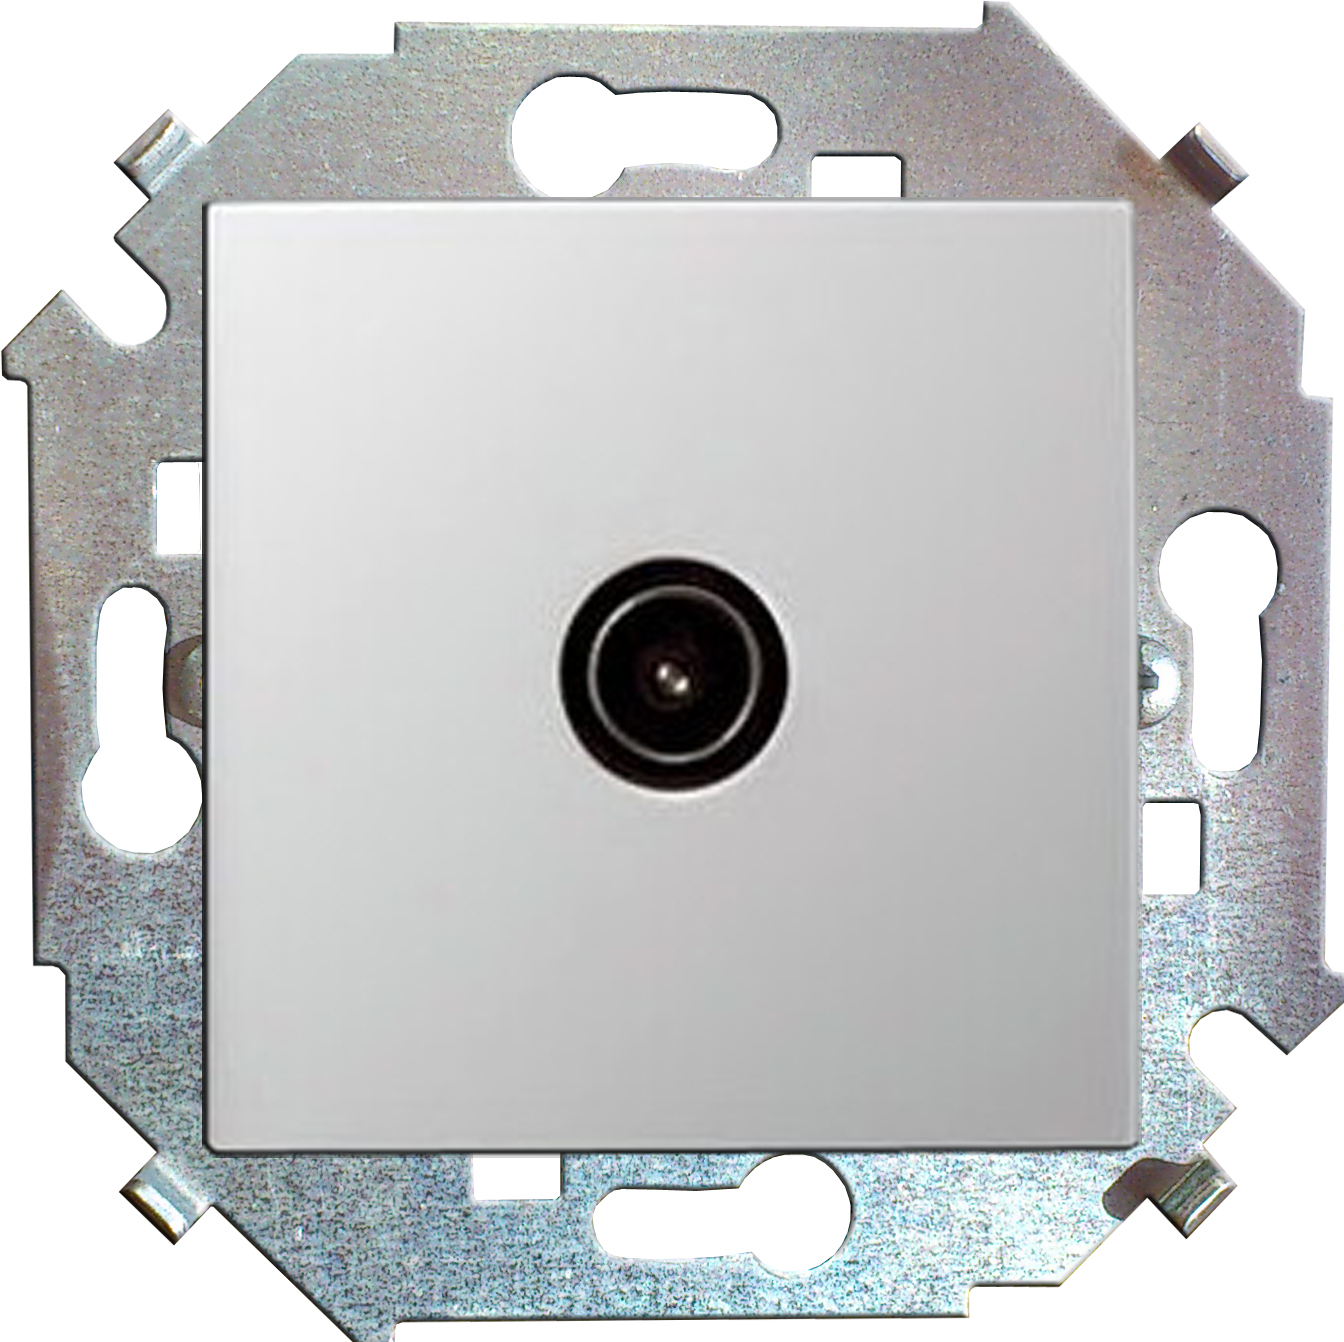 Розетка Simon 15 1591475-030 simon simon 15 белый розетка компьютерная 1 ая rj45 кат 5е 1591598 030